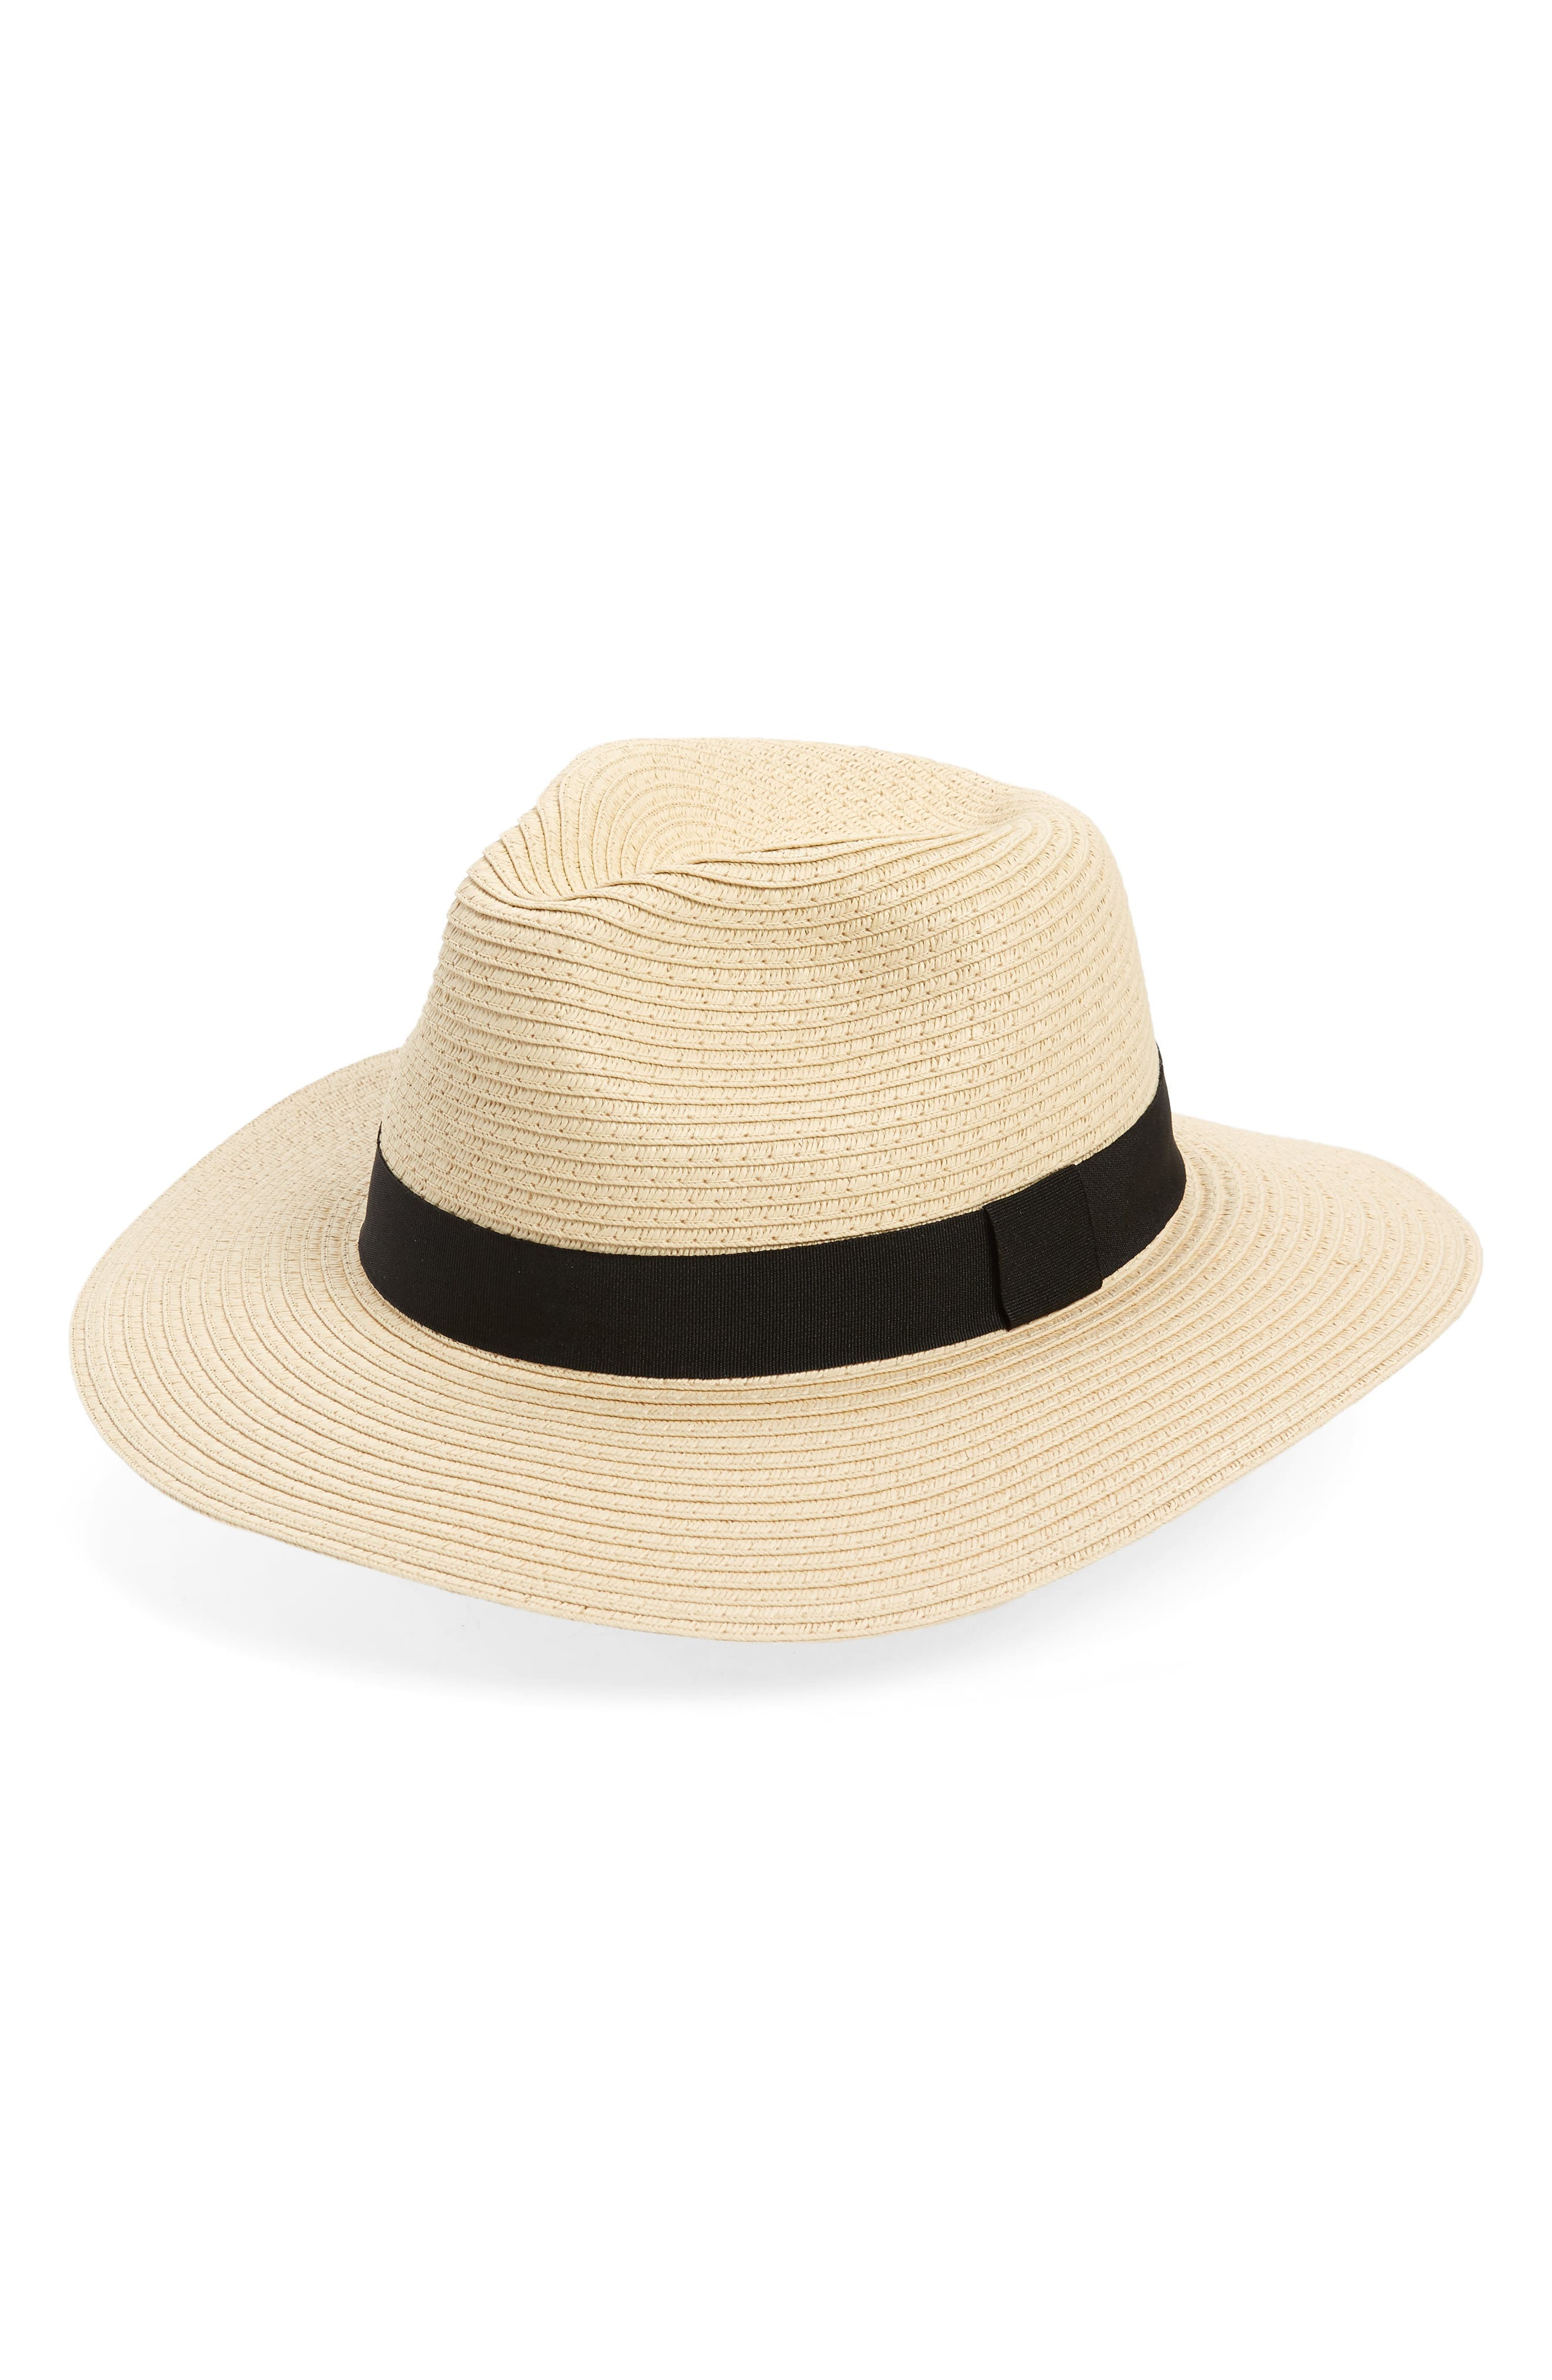 Straw Panama Hat,                         Main,                         color, Natural